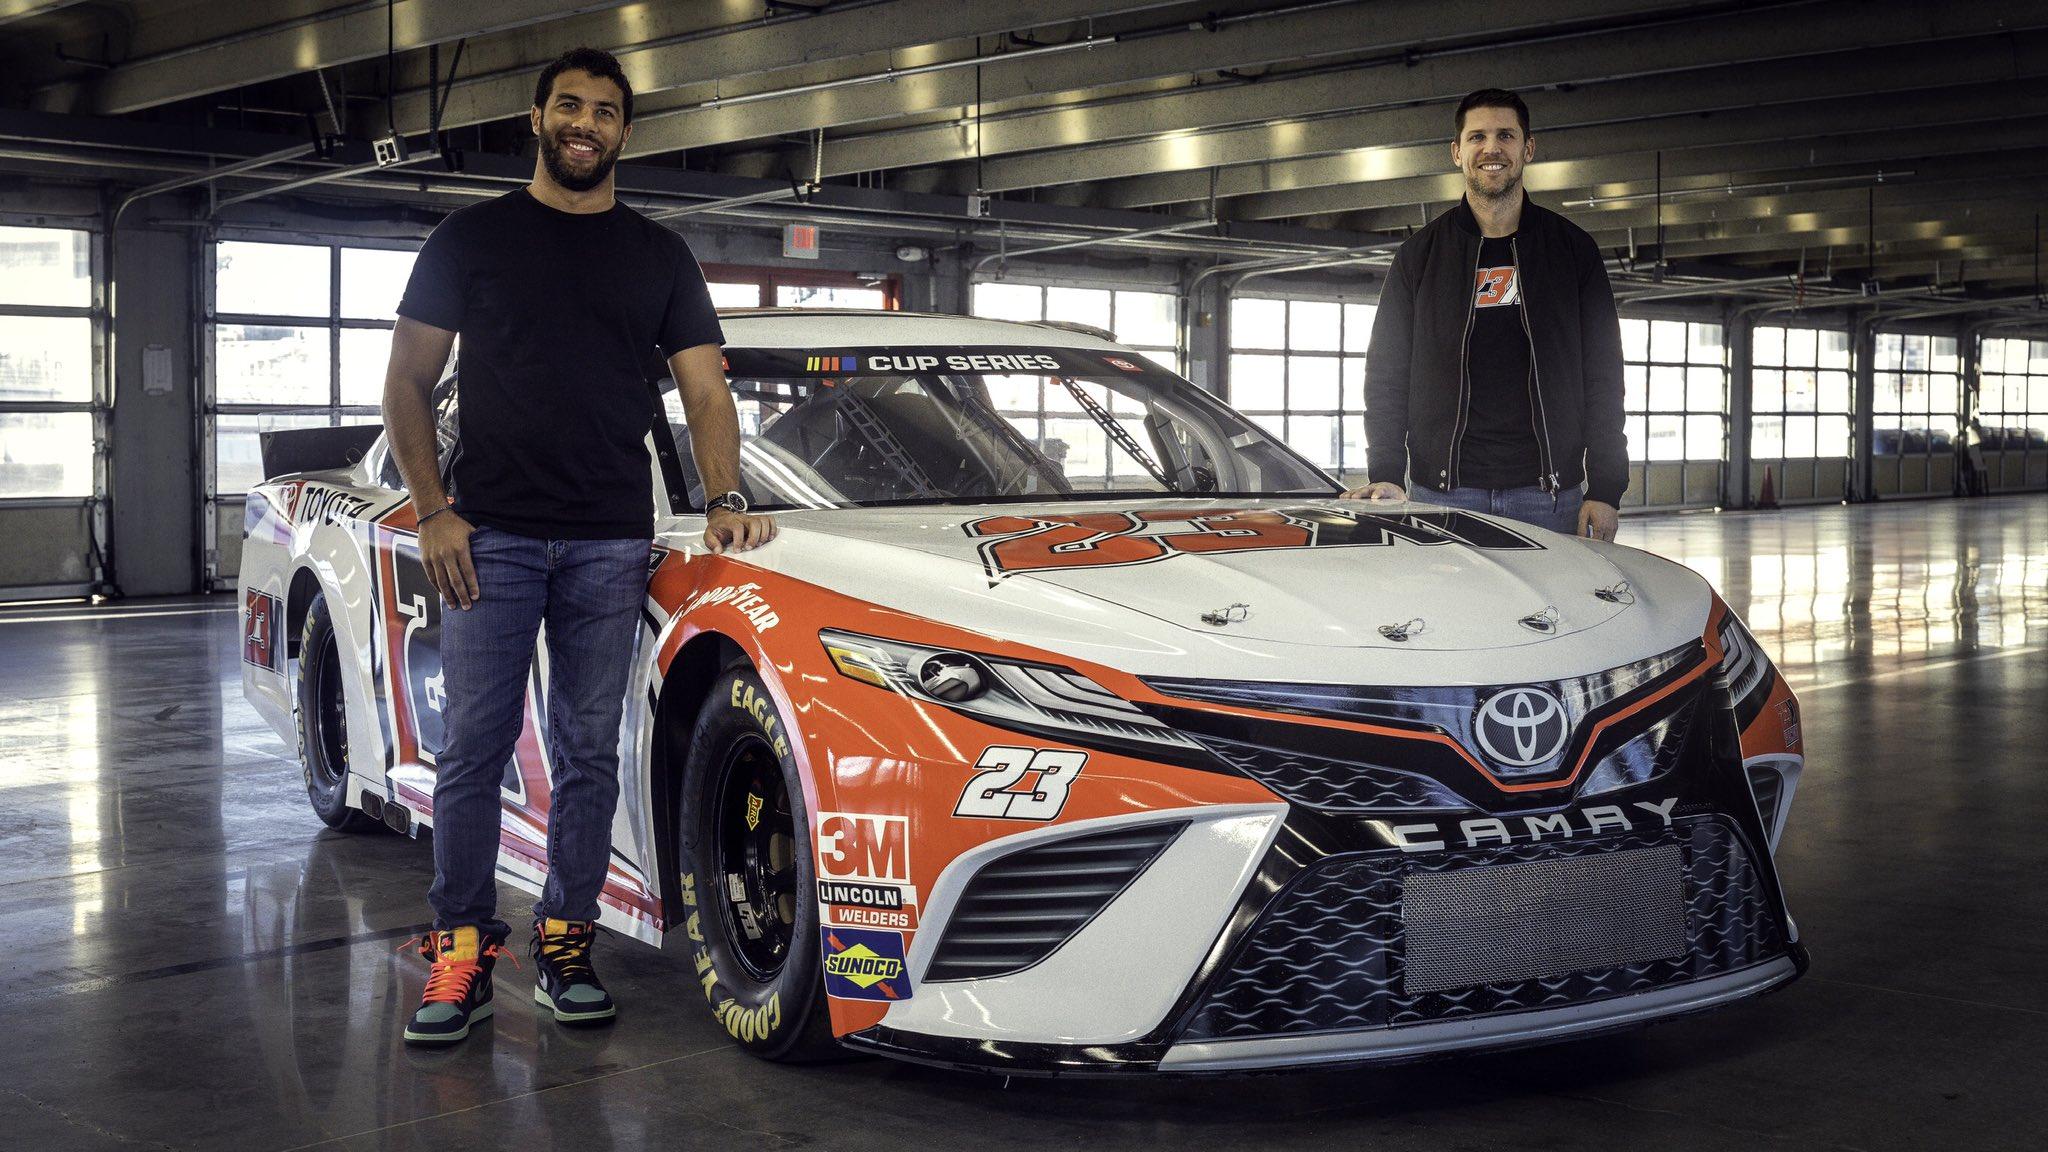 23XI Racing will make its NASCAR Cup Series debut at the Daytona 500 on February 14, 2021 at Daytona International Speedway. Photo by @23XIRacing